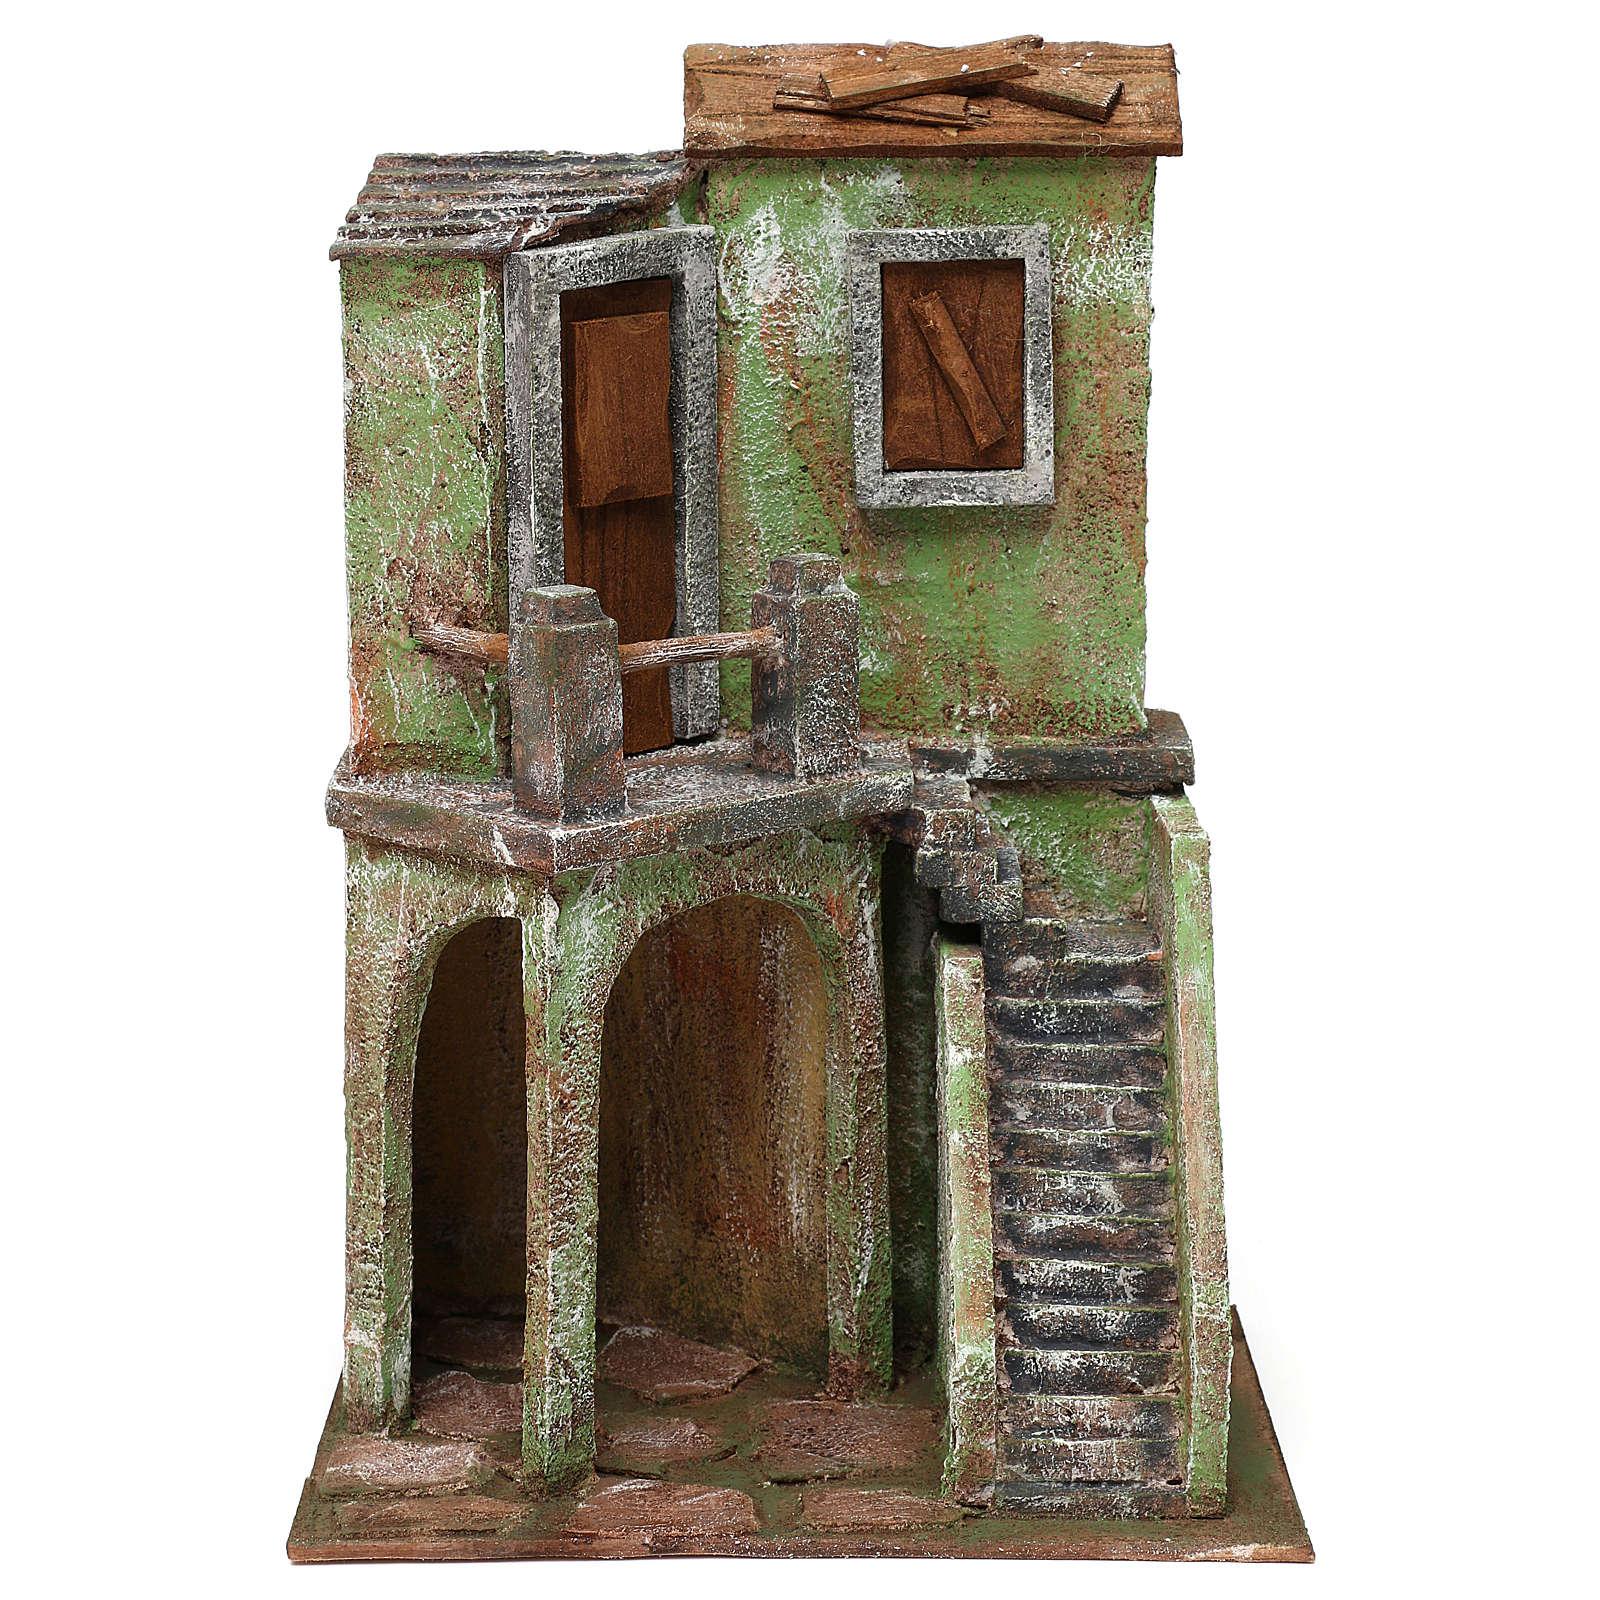 Casetta con scale e grotta di 35x25x15 cm per presepe di 10 cm 4